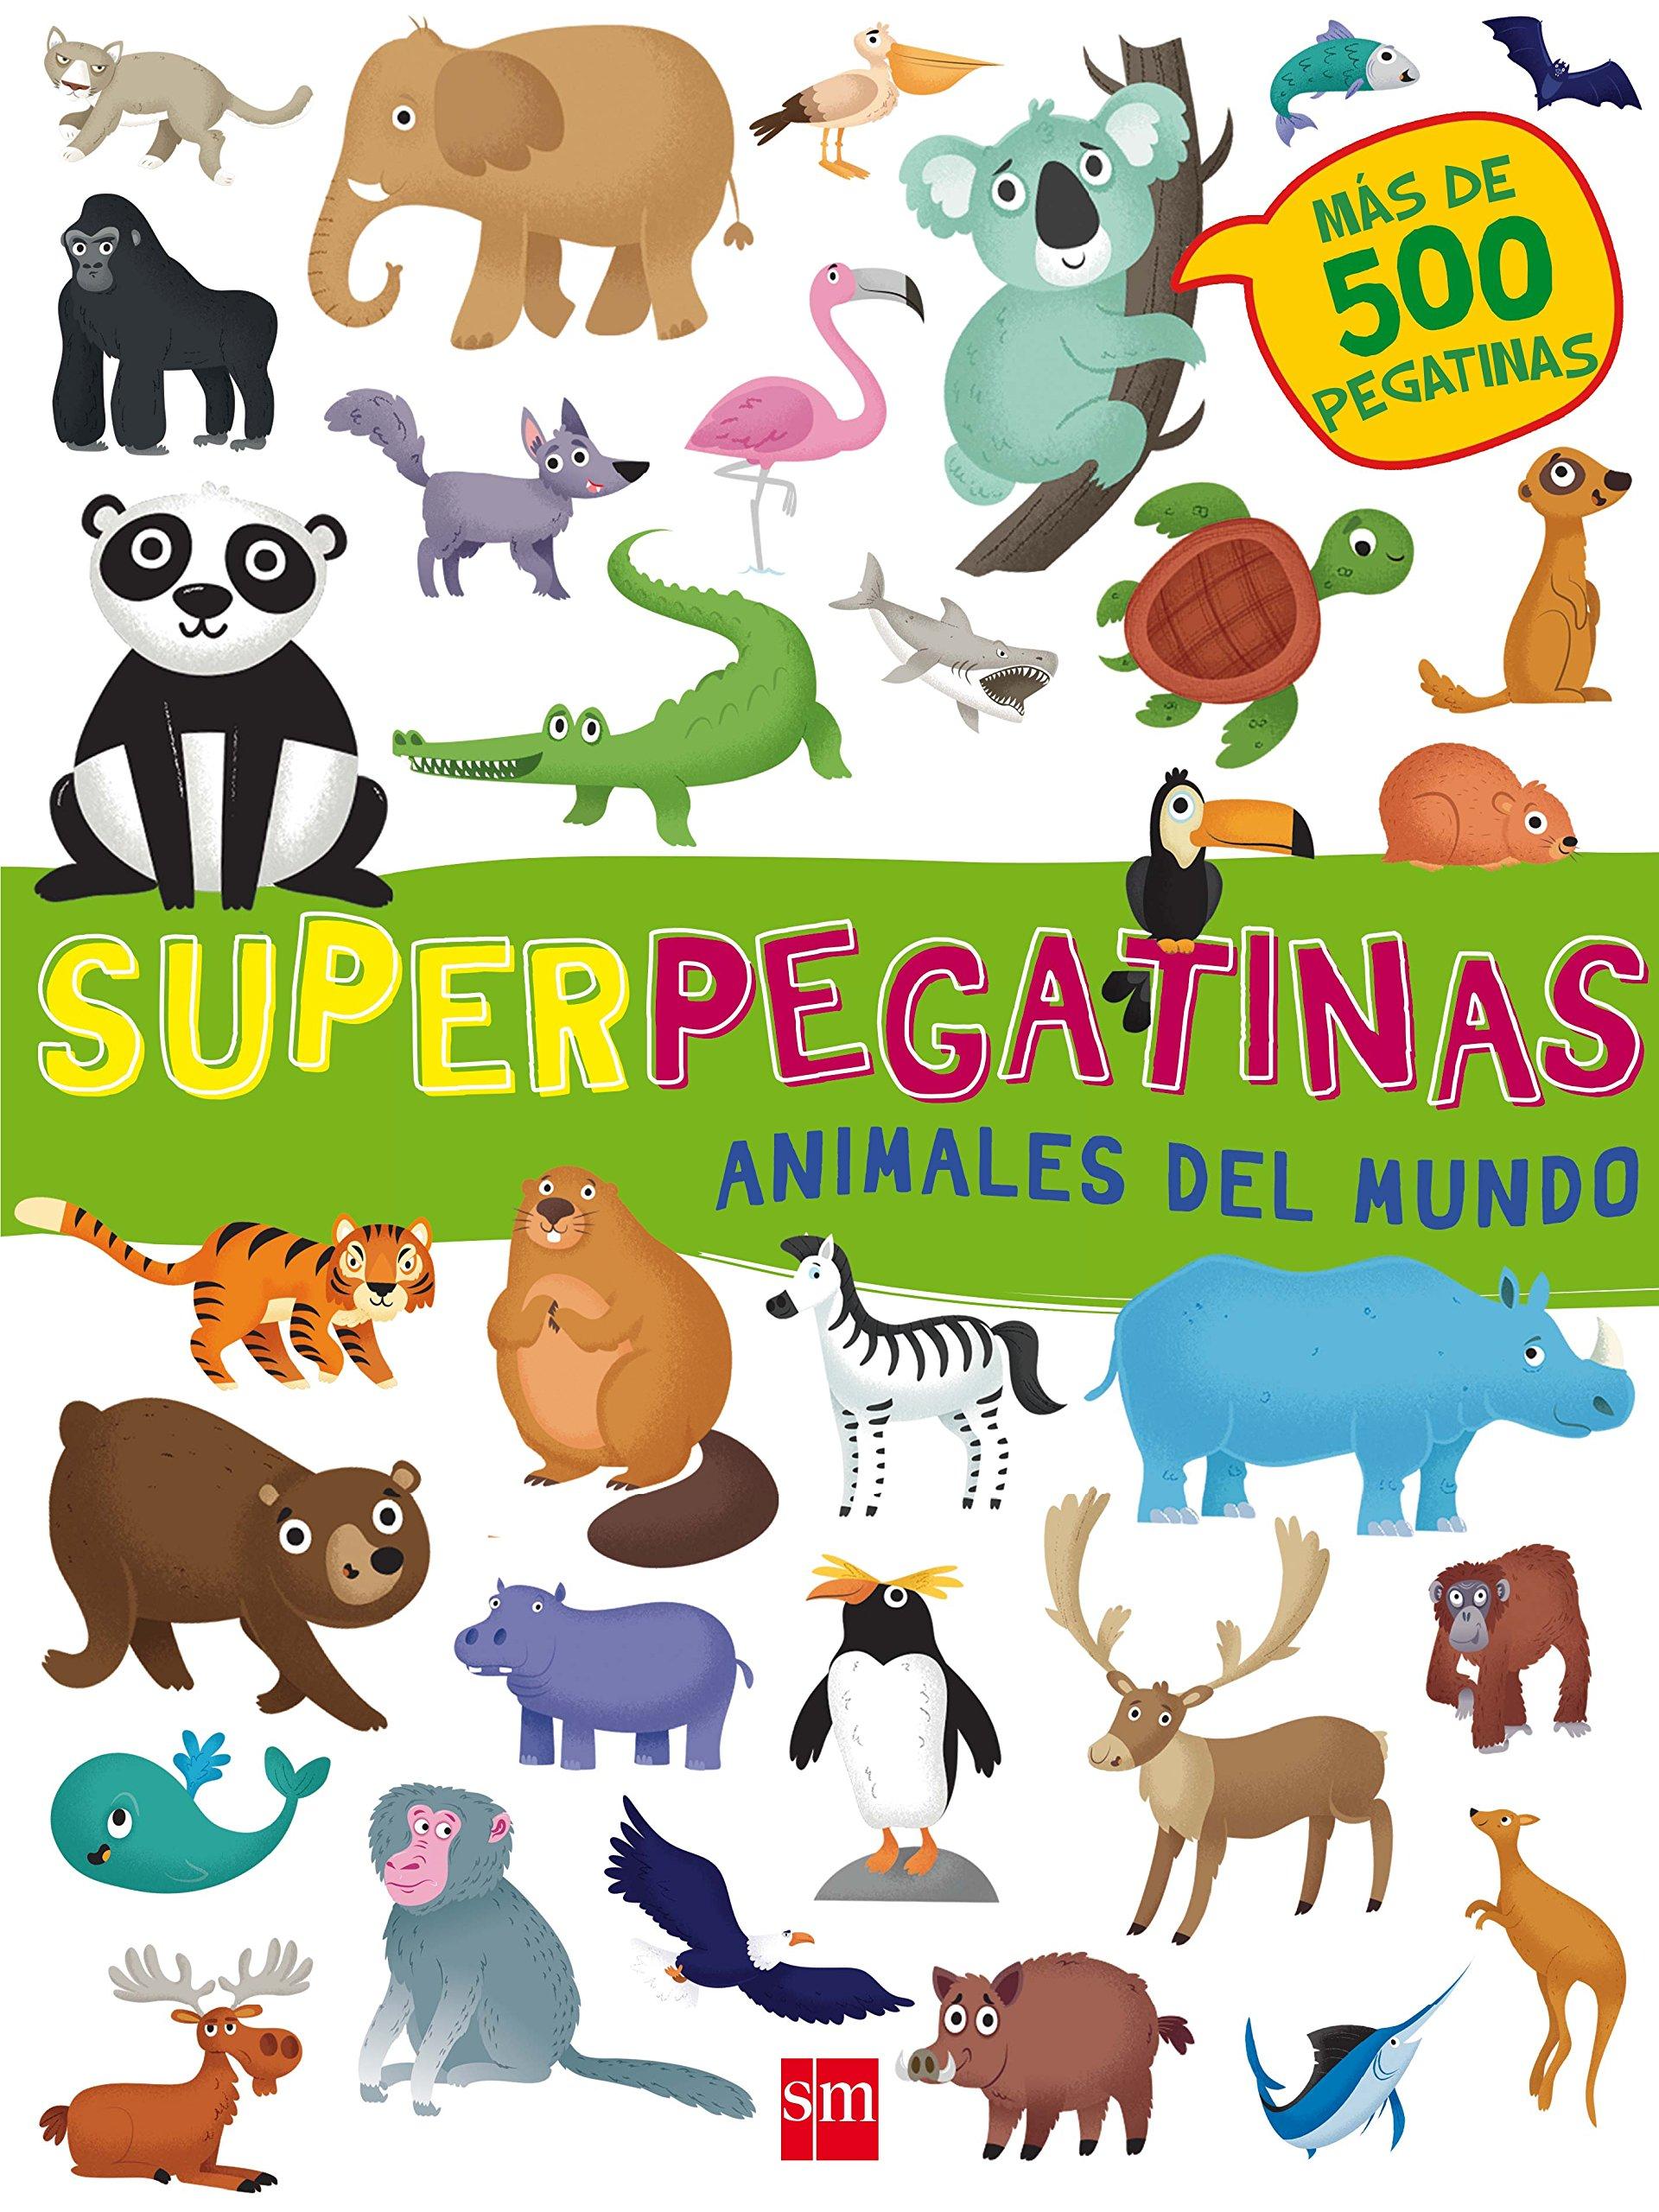 Animales del mundo (Pegatinas): Amazon.es: Libri, De Agostini, Cerato, Mattia, Cabanillas Resino, Marta: Libros